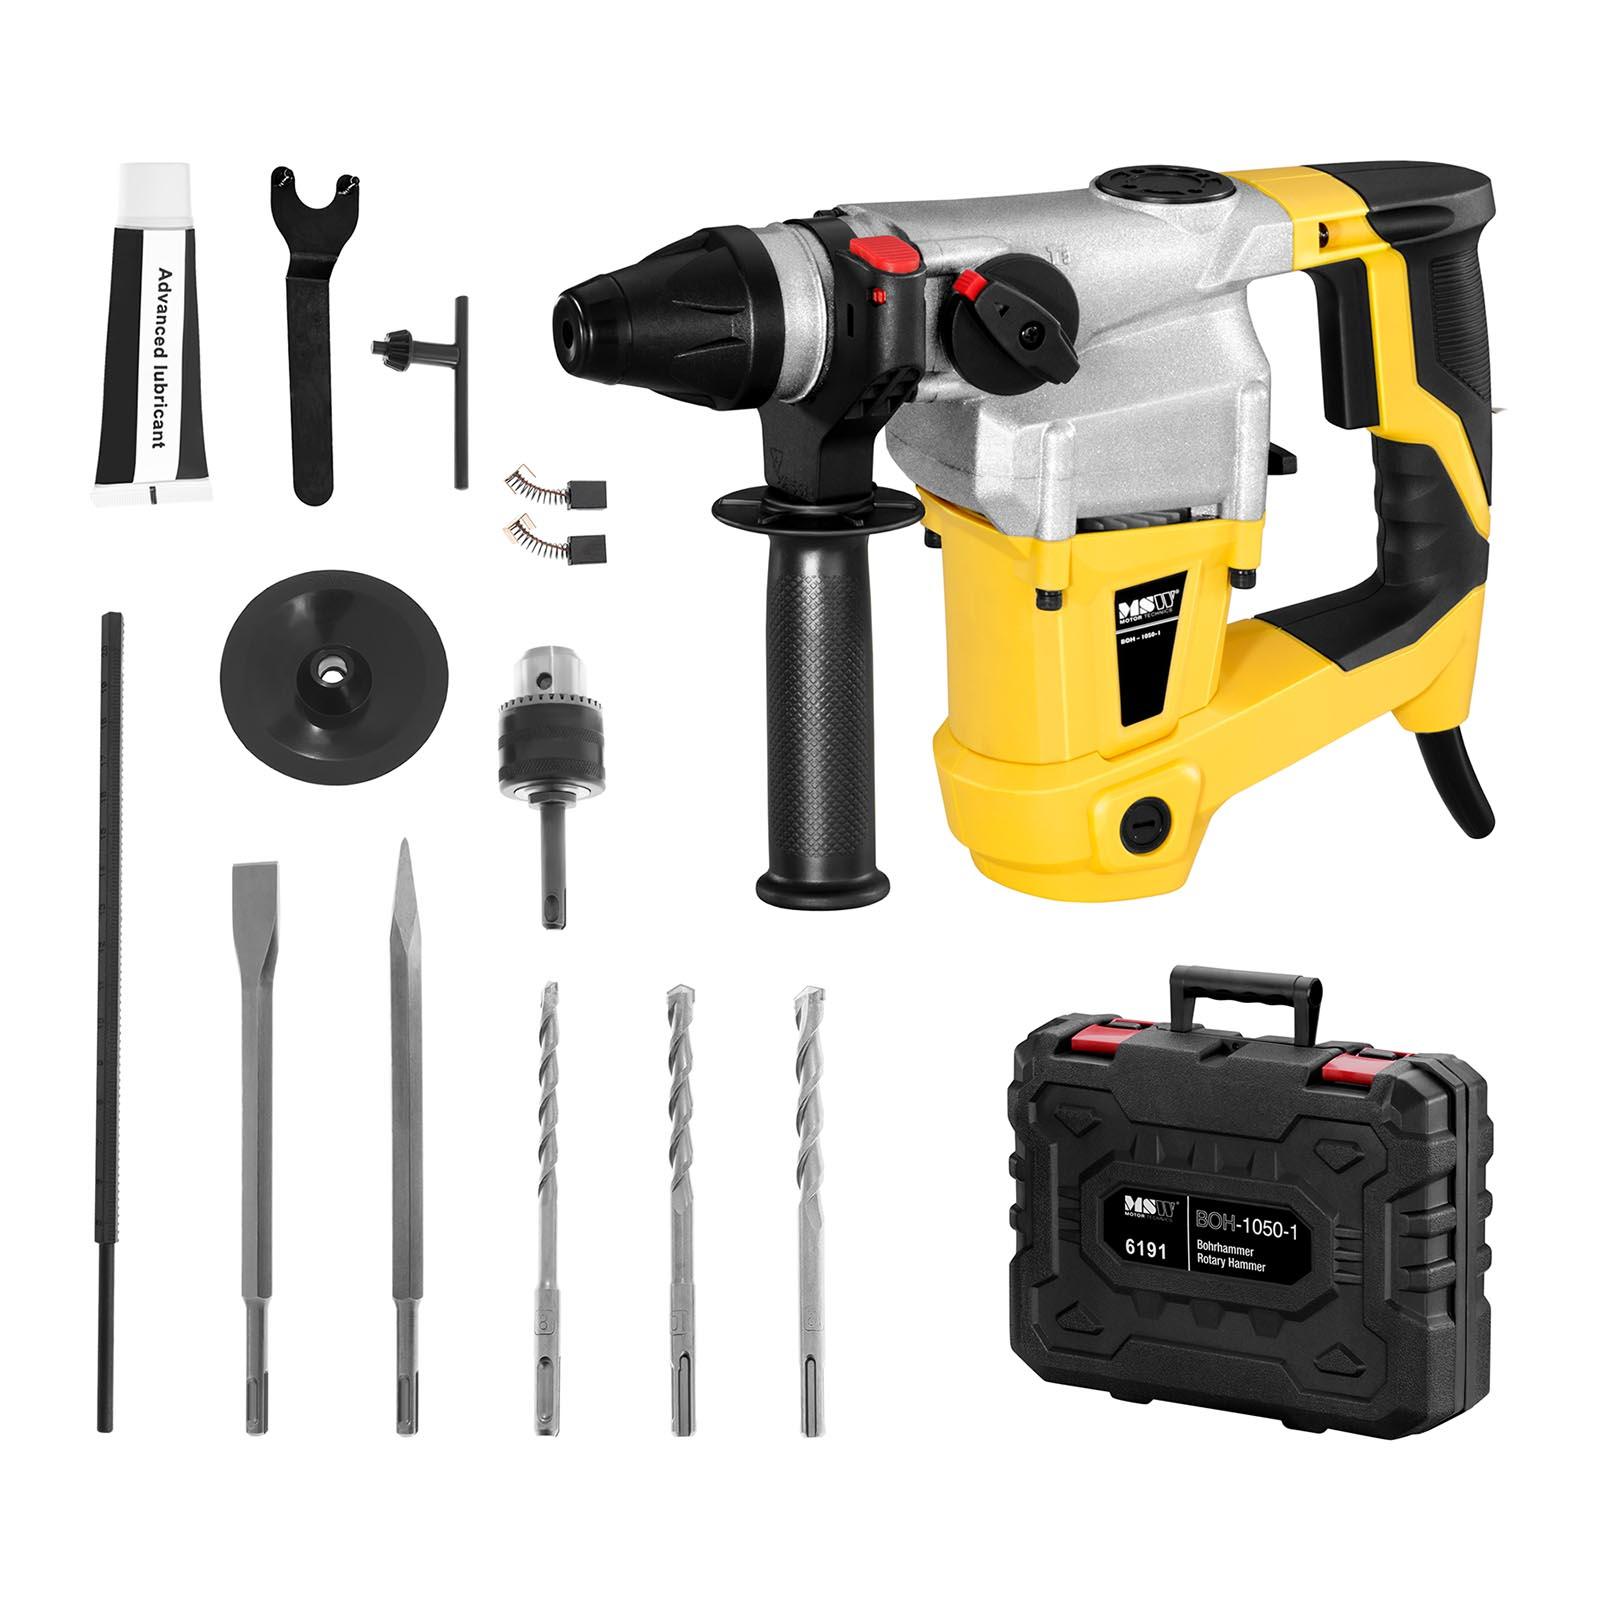 MSW Bohrhammer - 1.050 W - 1.050 U/min - 5.200 S/min BOH-1050-1